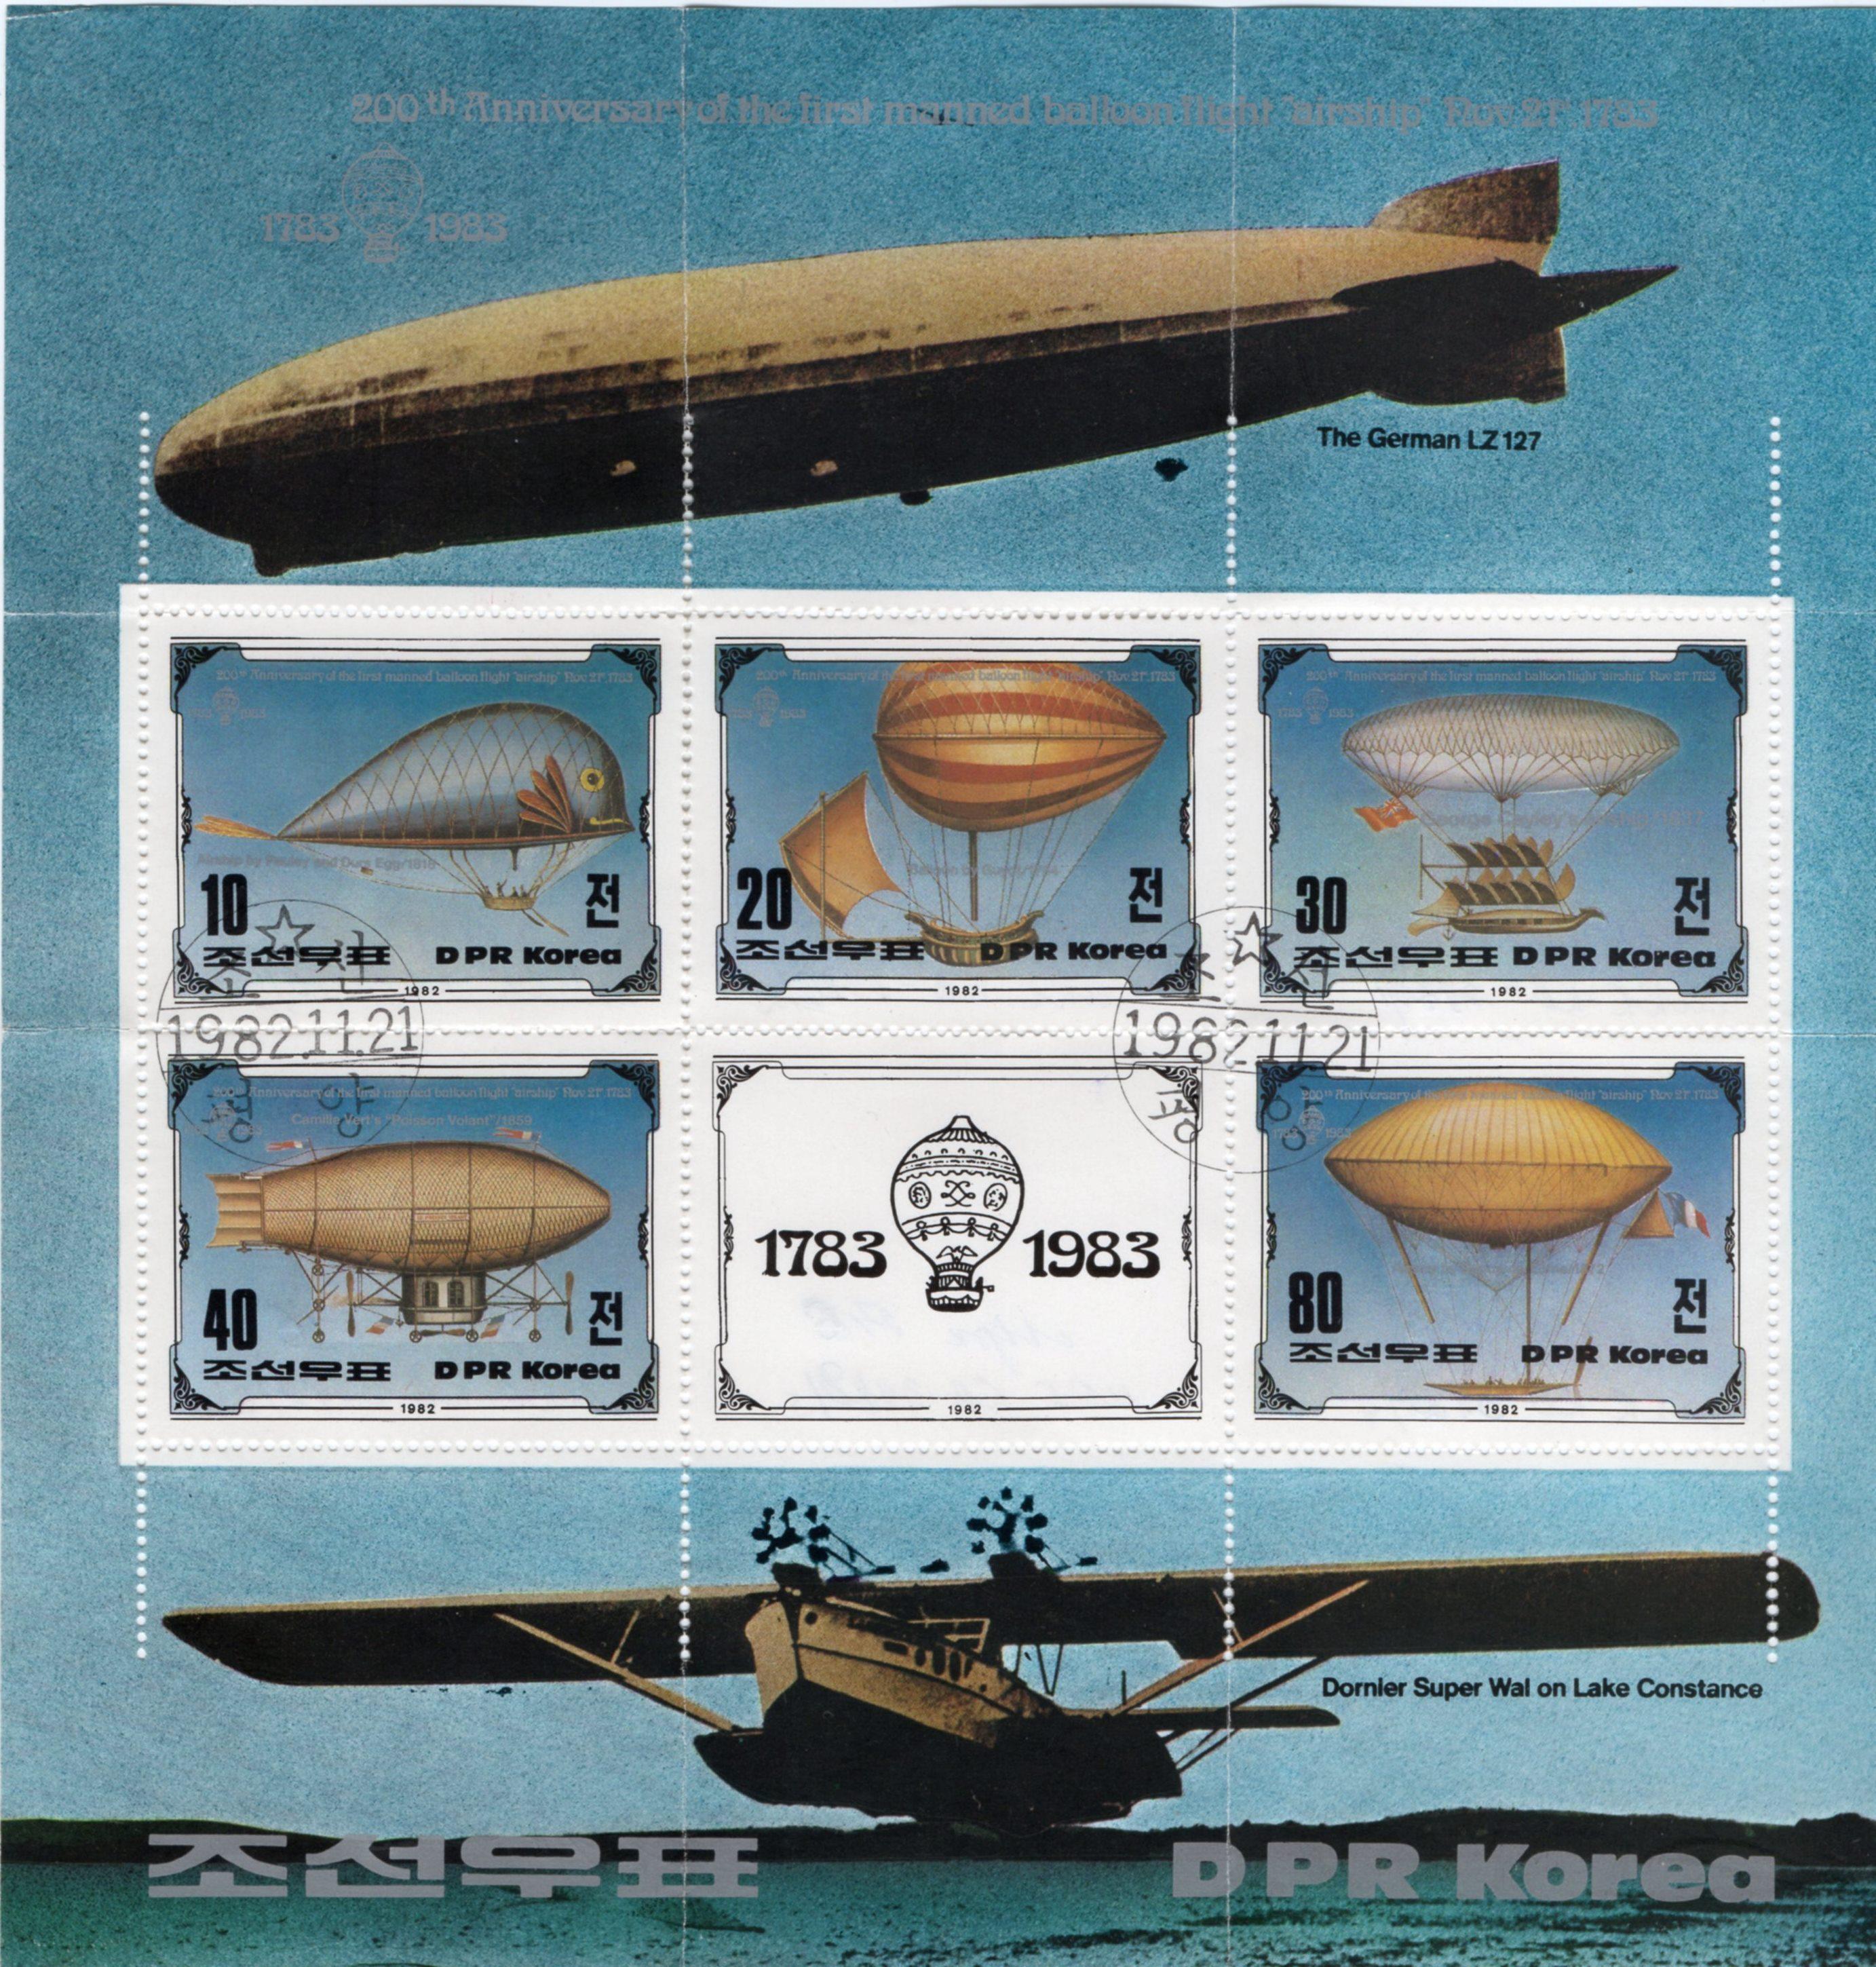 "Блок марок поштовий гашений. ""The German LZ 127. Dornier Super Wal on Lake Constance. 200th Anniversary of The First Manned Balloon Flight. Nov 21 st. 1783. DPR Korea"""